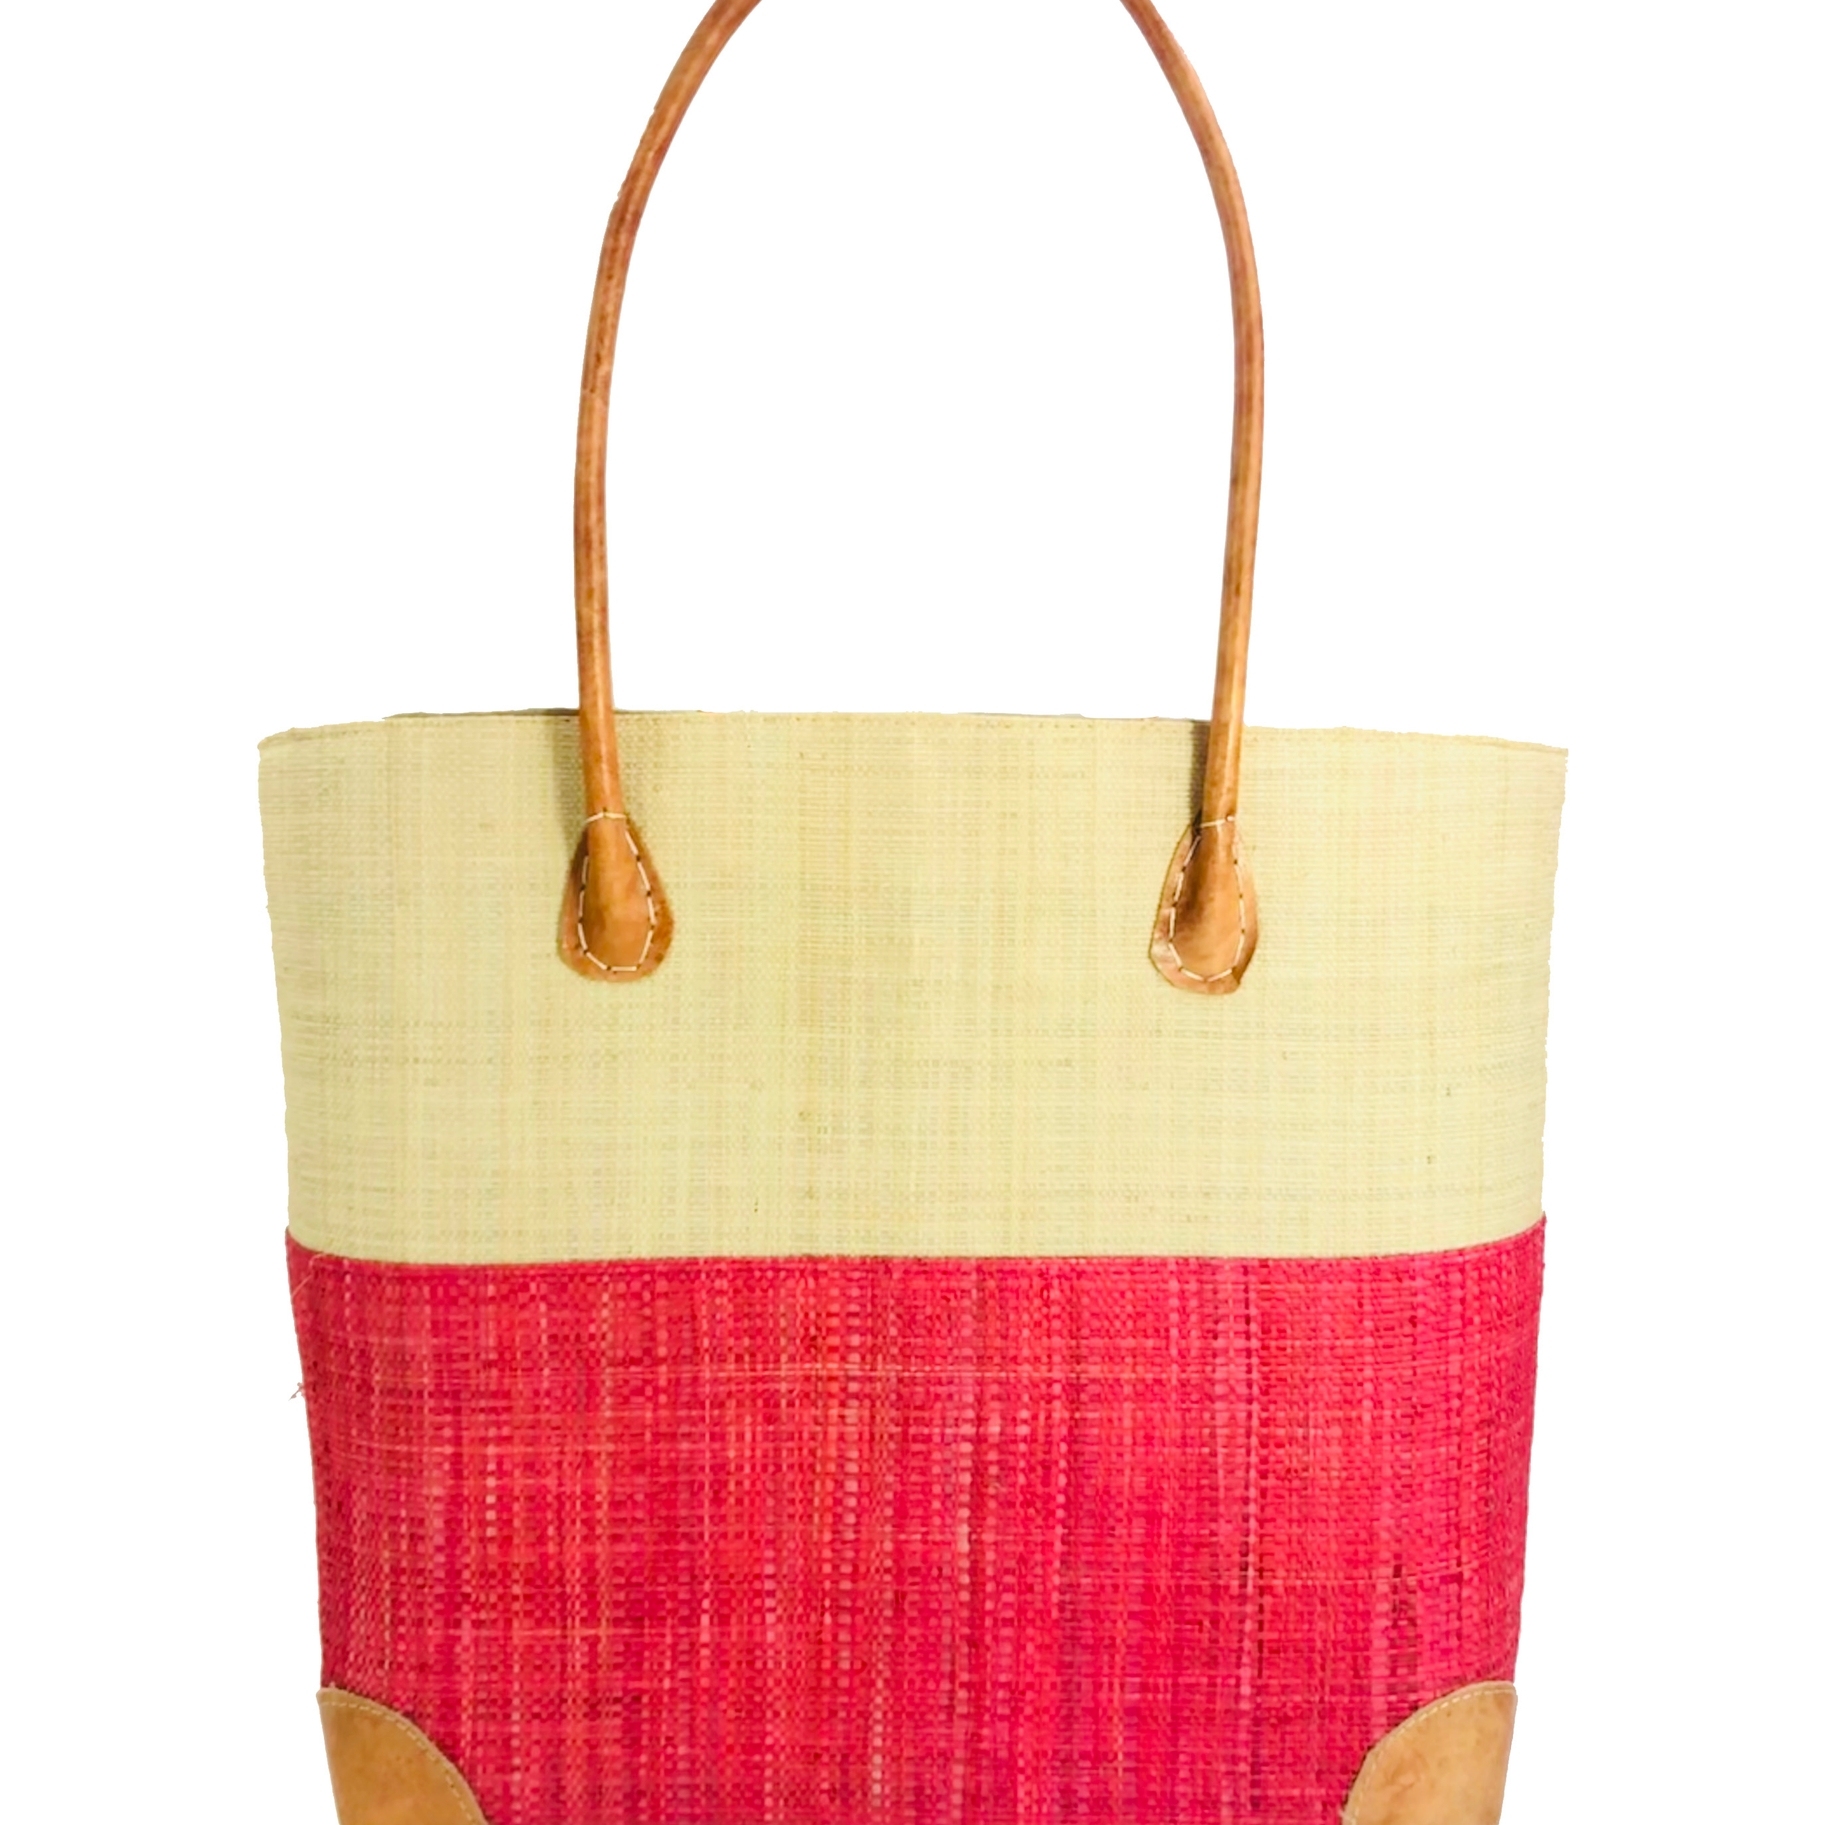 Trinidad Two Tone Straw Basket - Raspberry | Trada Marketplace